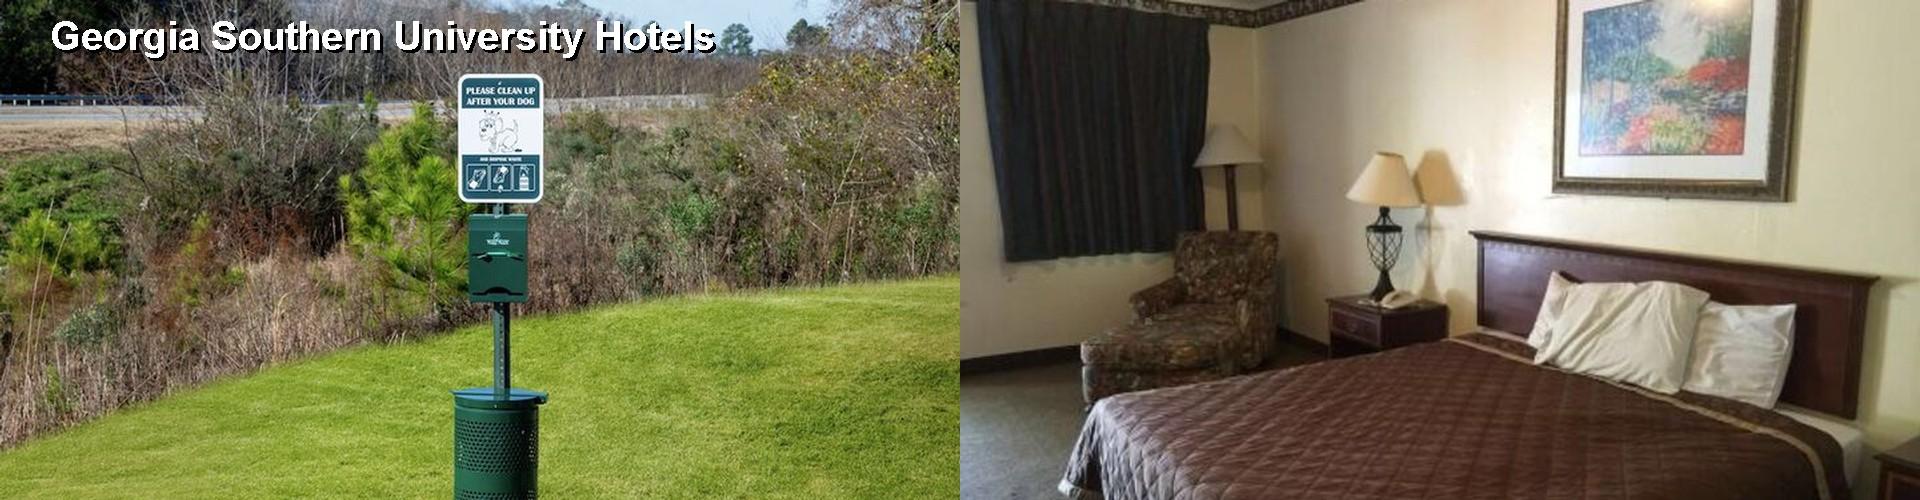 5 Best Hotels Near Georgia Southern University